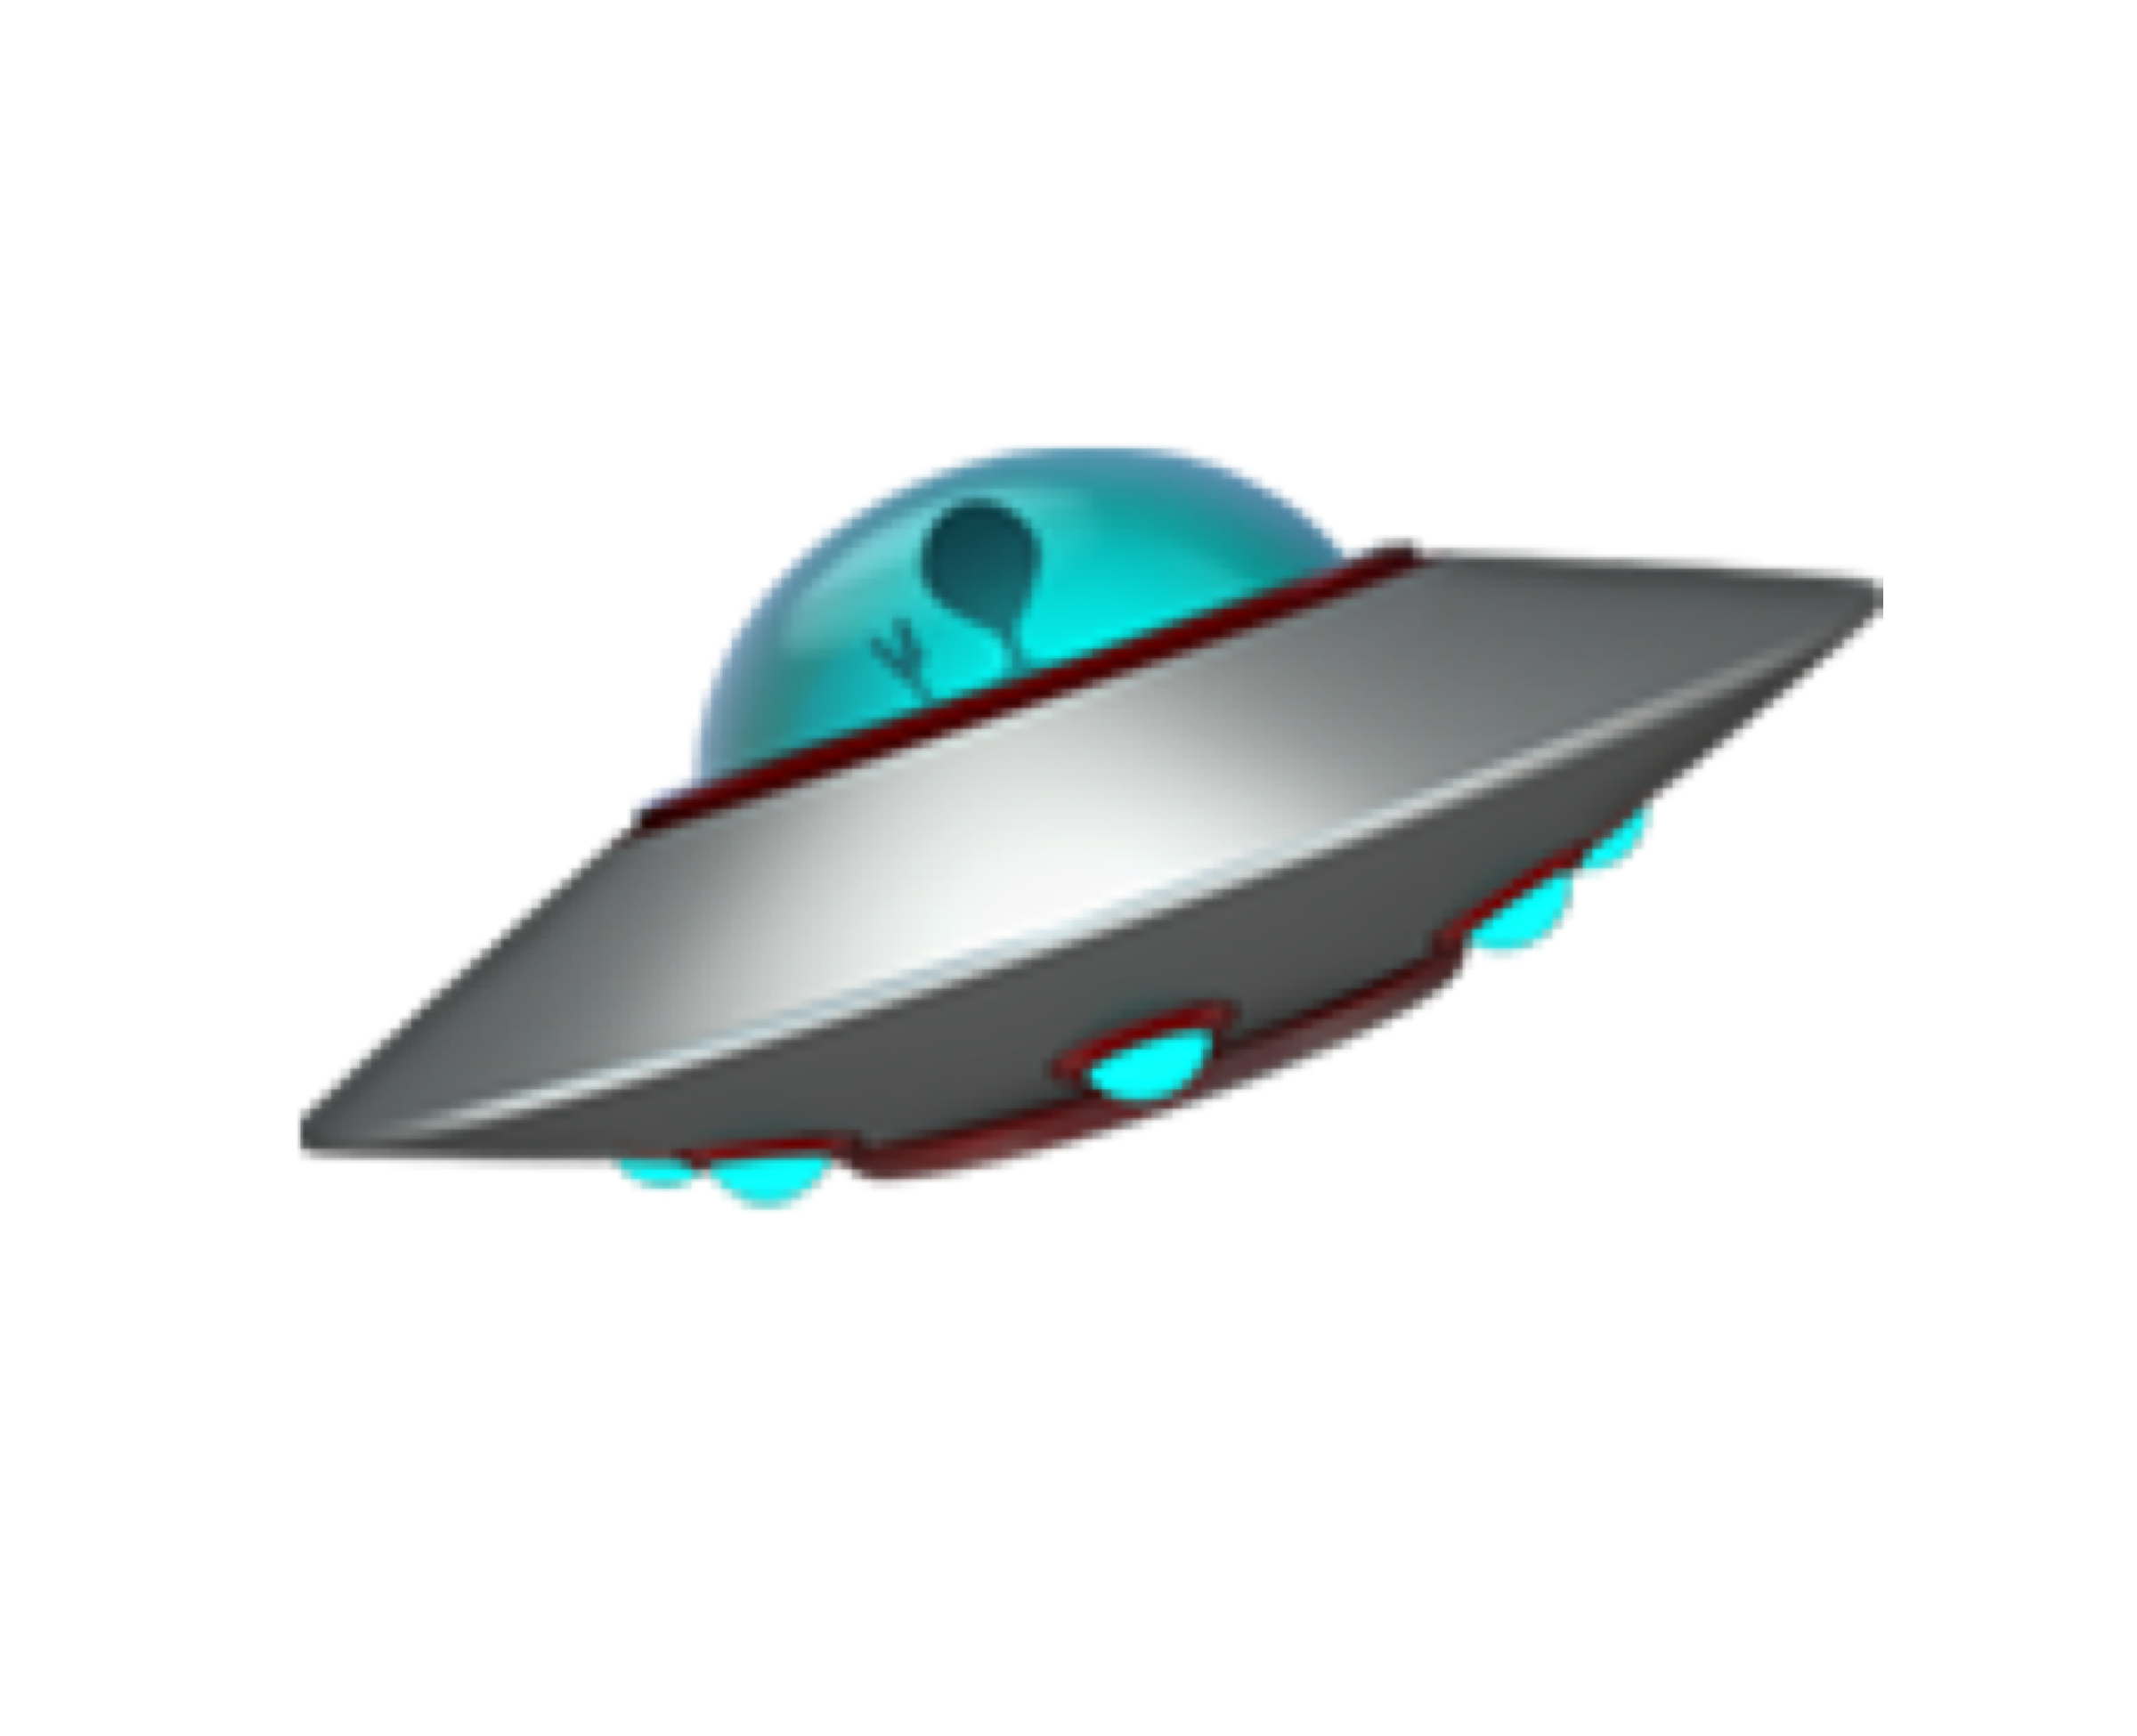 UFO (🛸)